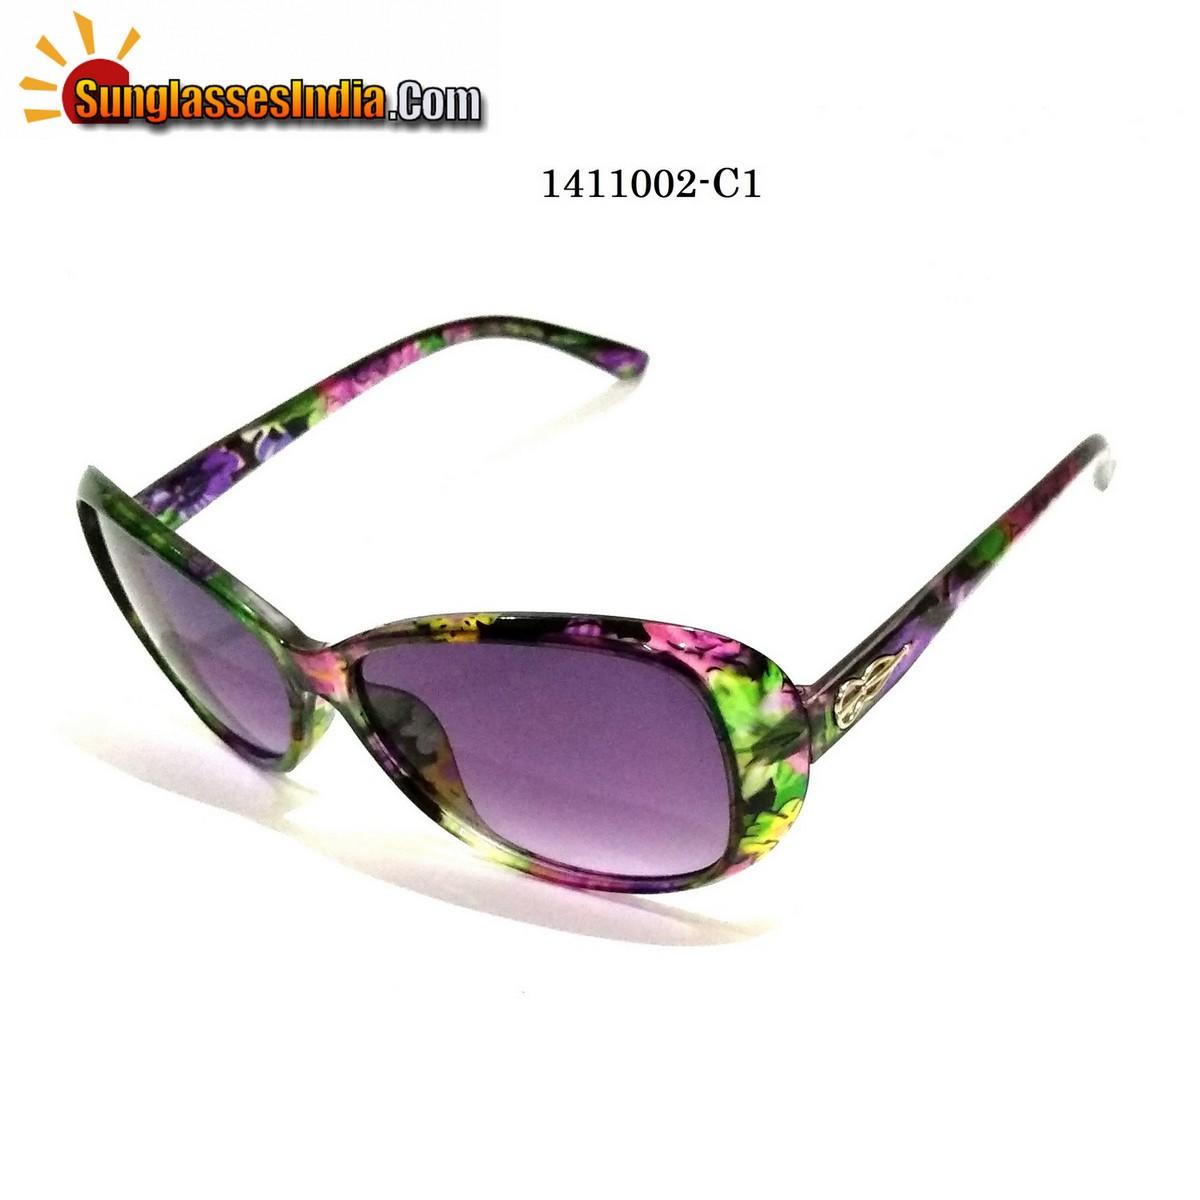 Floral Print Ladies Women Sunglasses Model 1141002C1